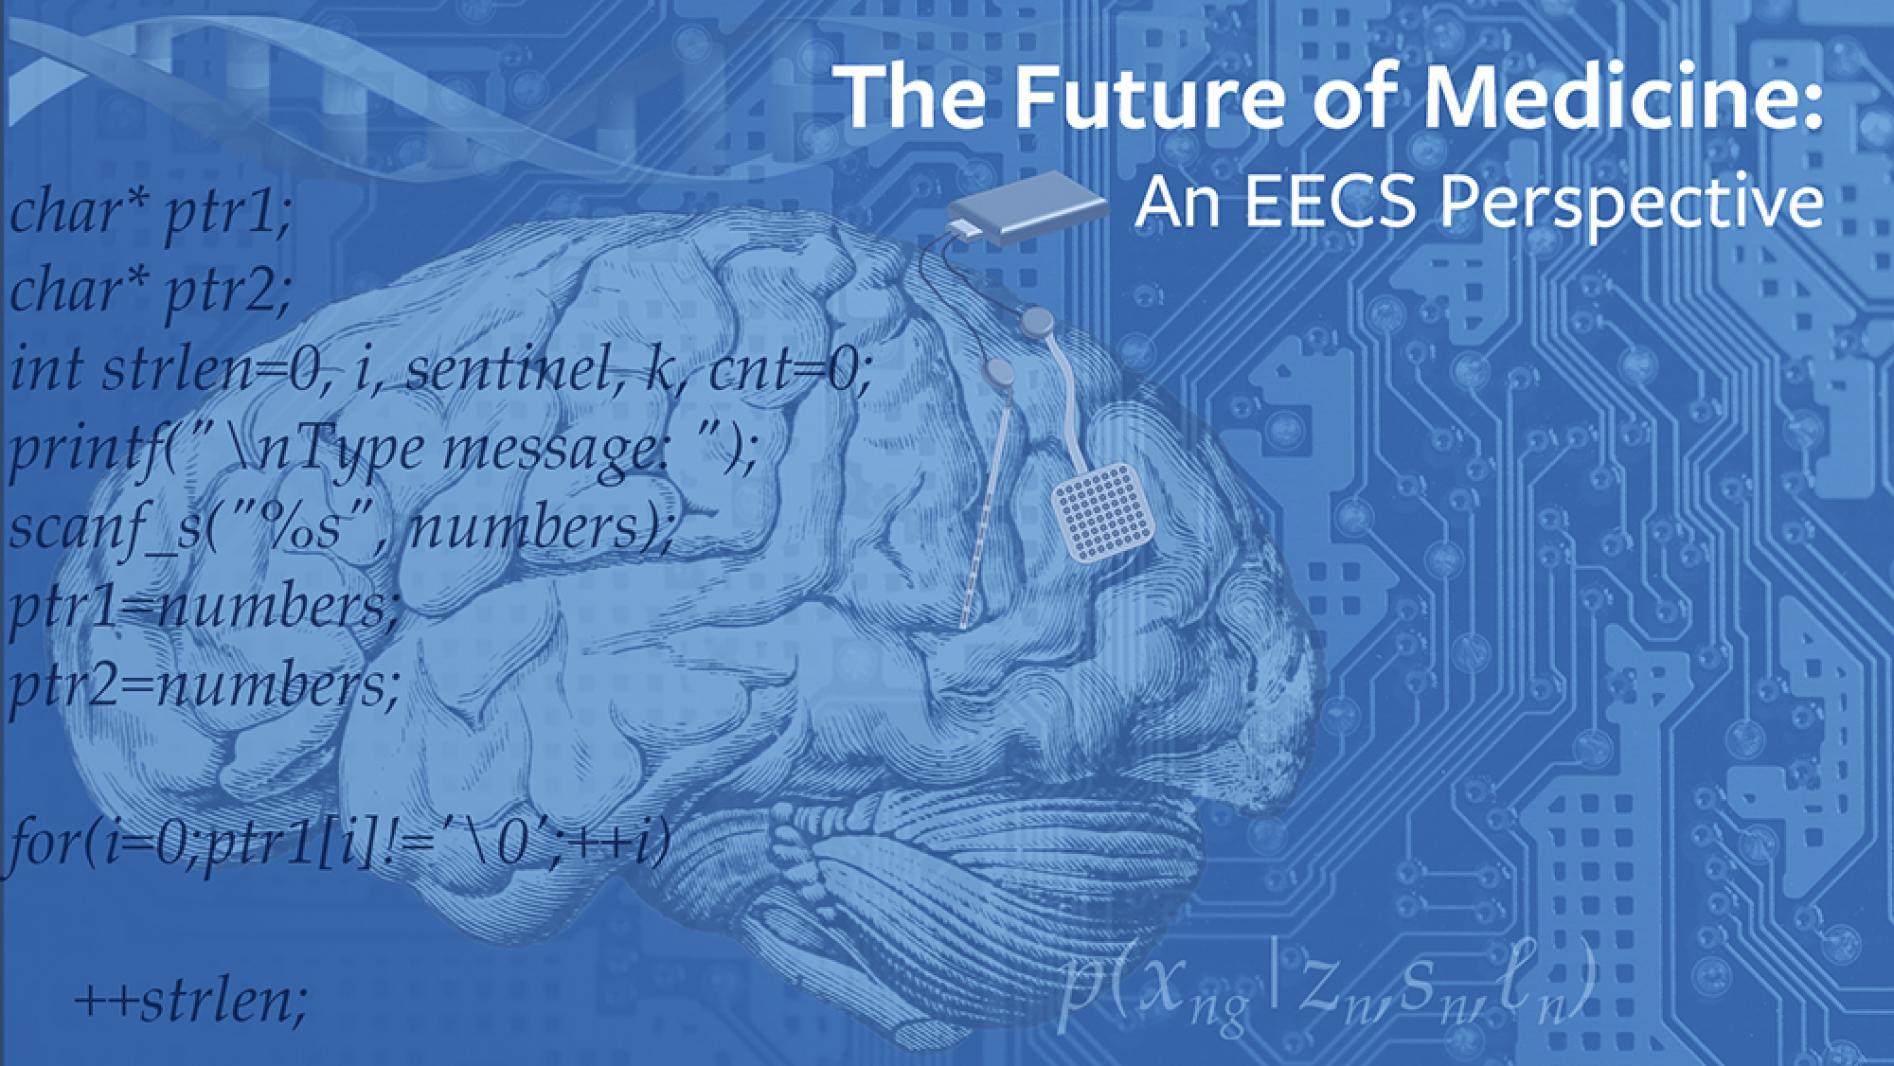 Eecs At Uc Berkeley Electrical Engineering 4 Year Plan Bears Conference